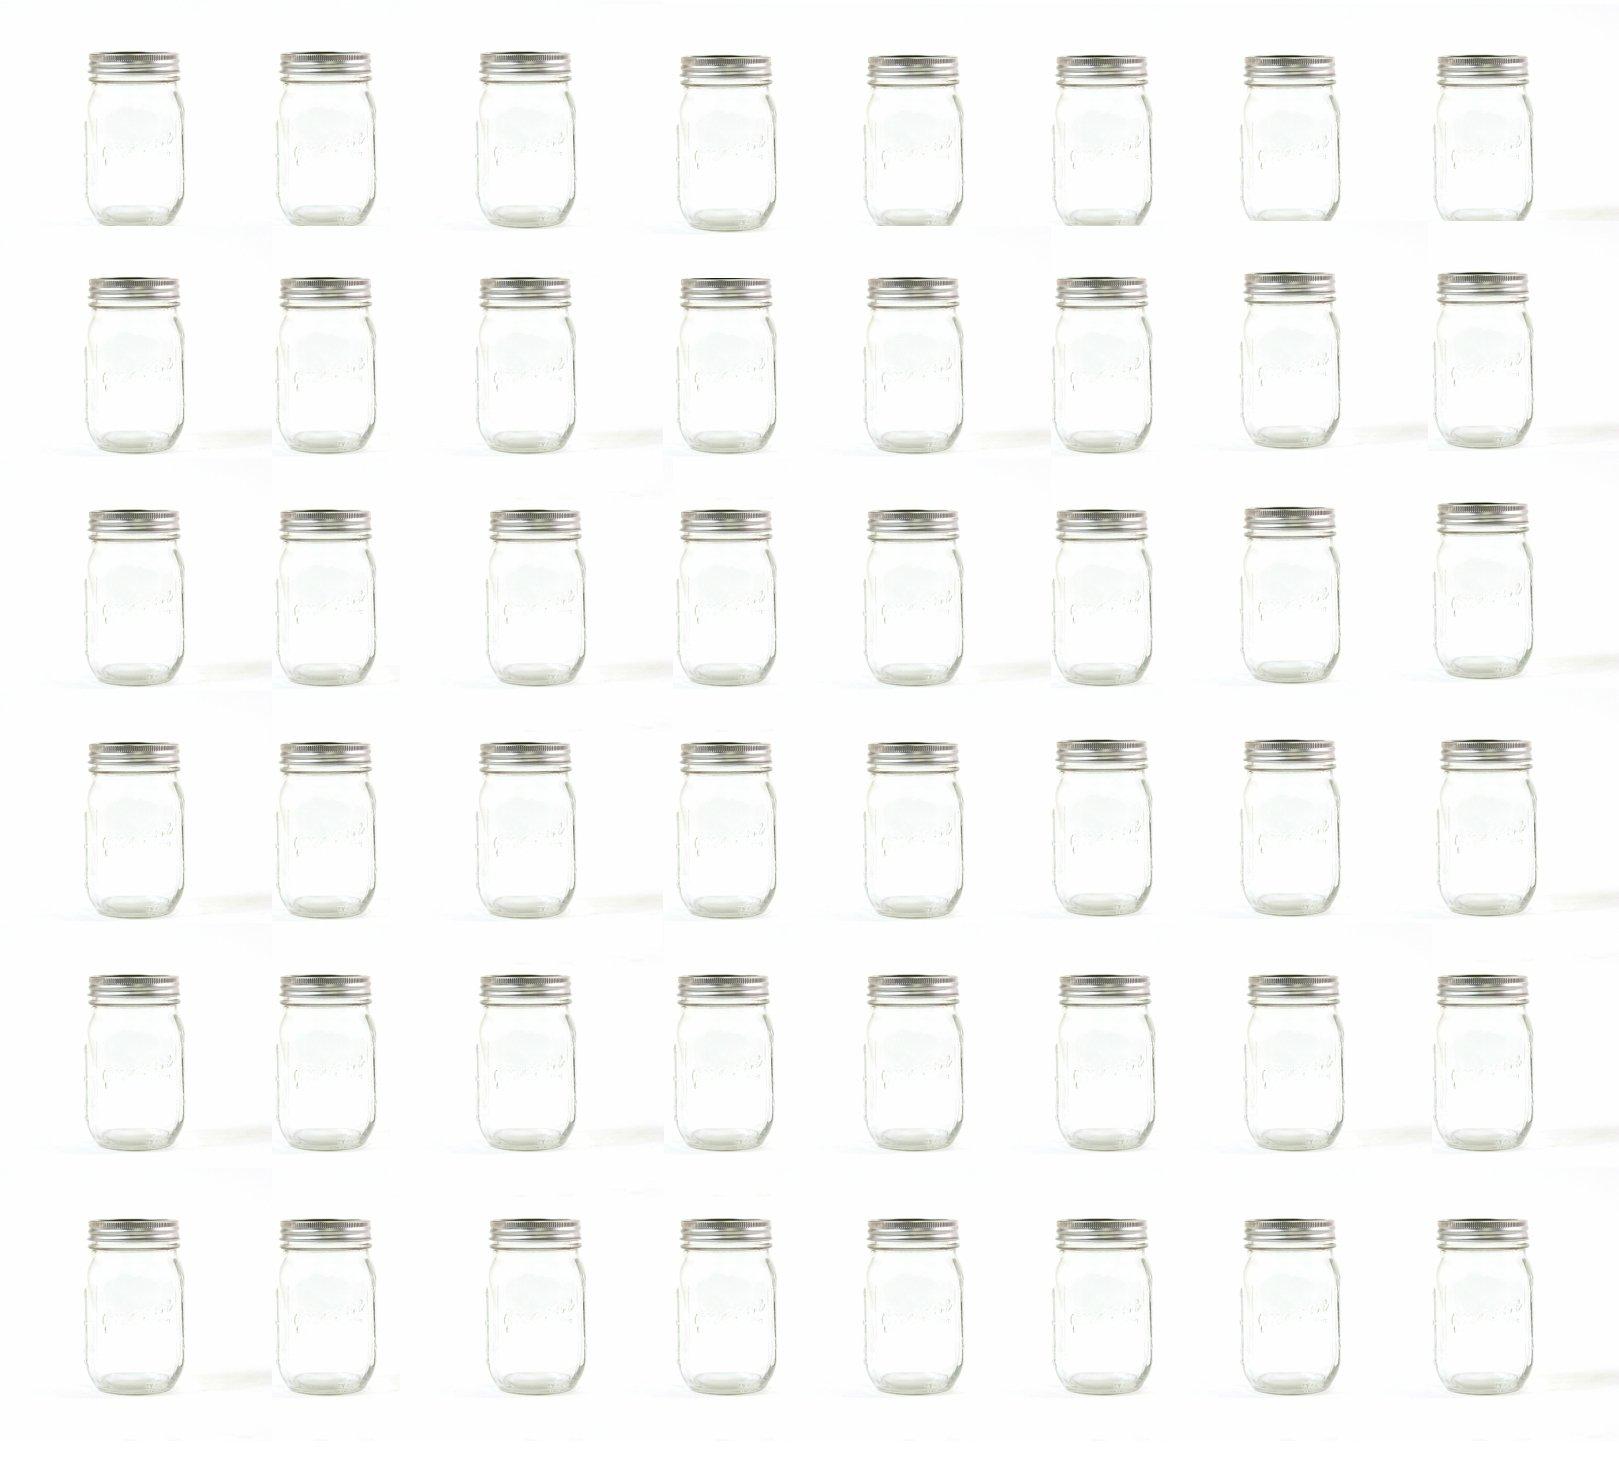 Koyal Wholesale BULK 48-Pack Vintage Drinking Mason Jar 16 oz for Wellness Infusing Water, Smoothies, Salad Container, Yogurt, Everyday Decoration, Storage, Less than $2 per Jar